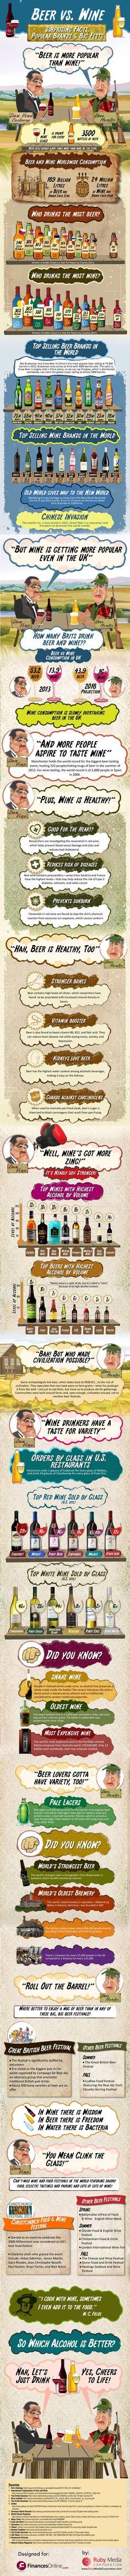 Beer vs. Wine: Surprising Facts, Popular Brands and Big Festivals